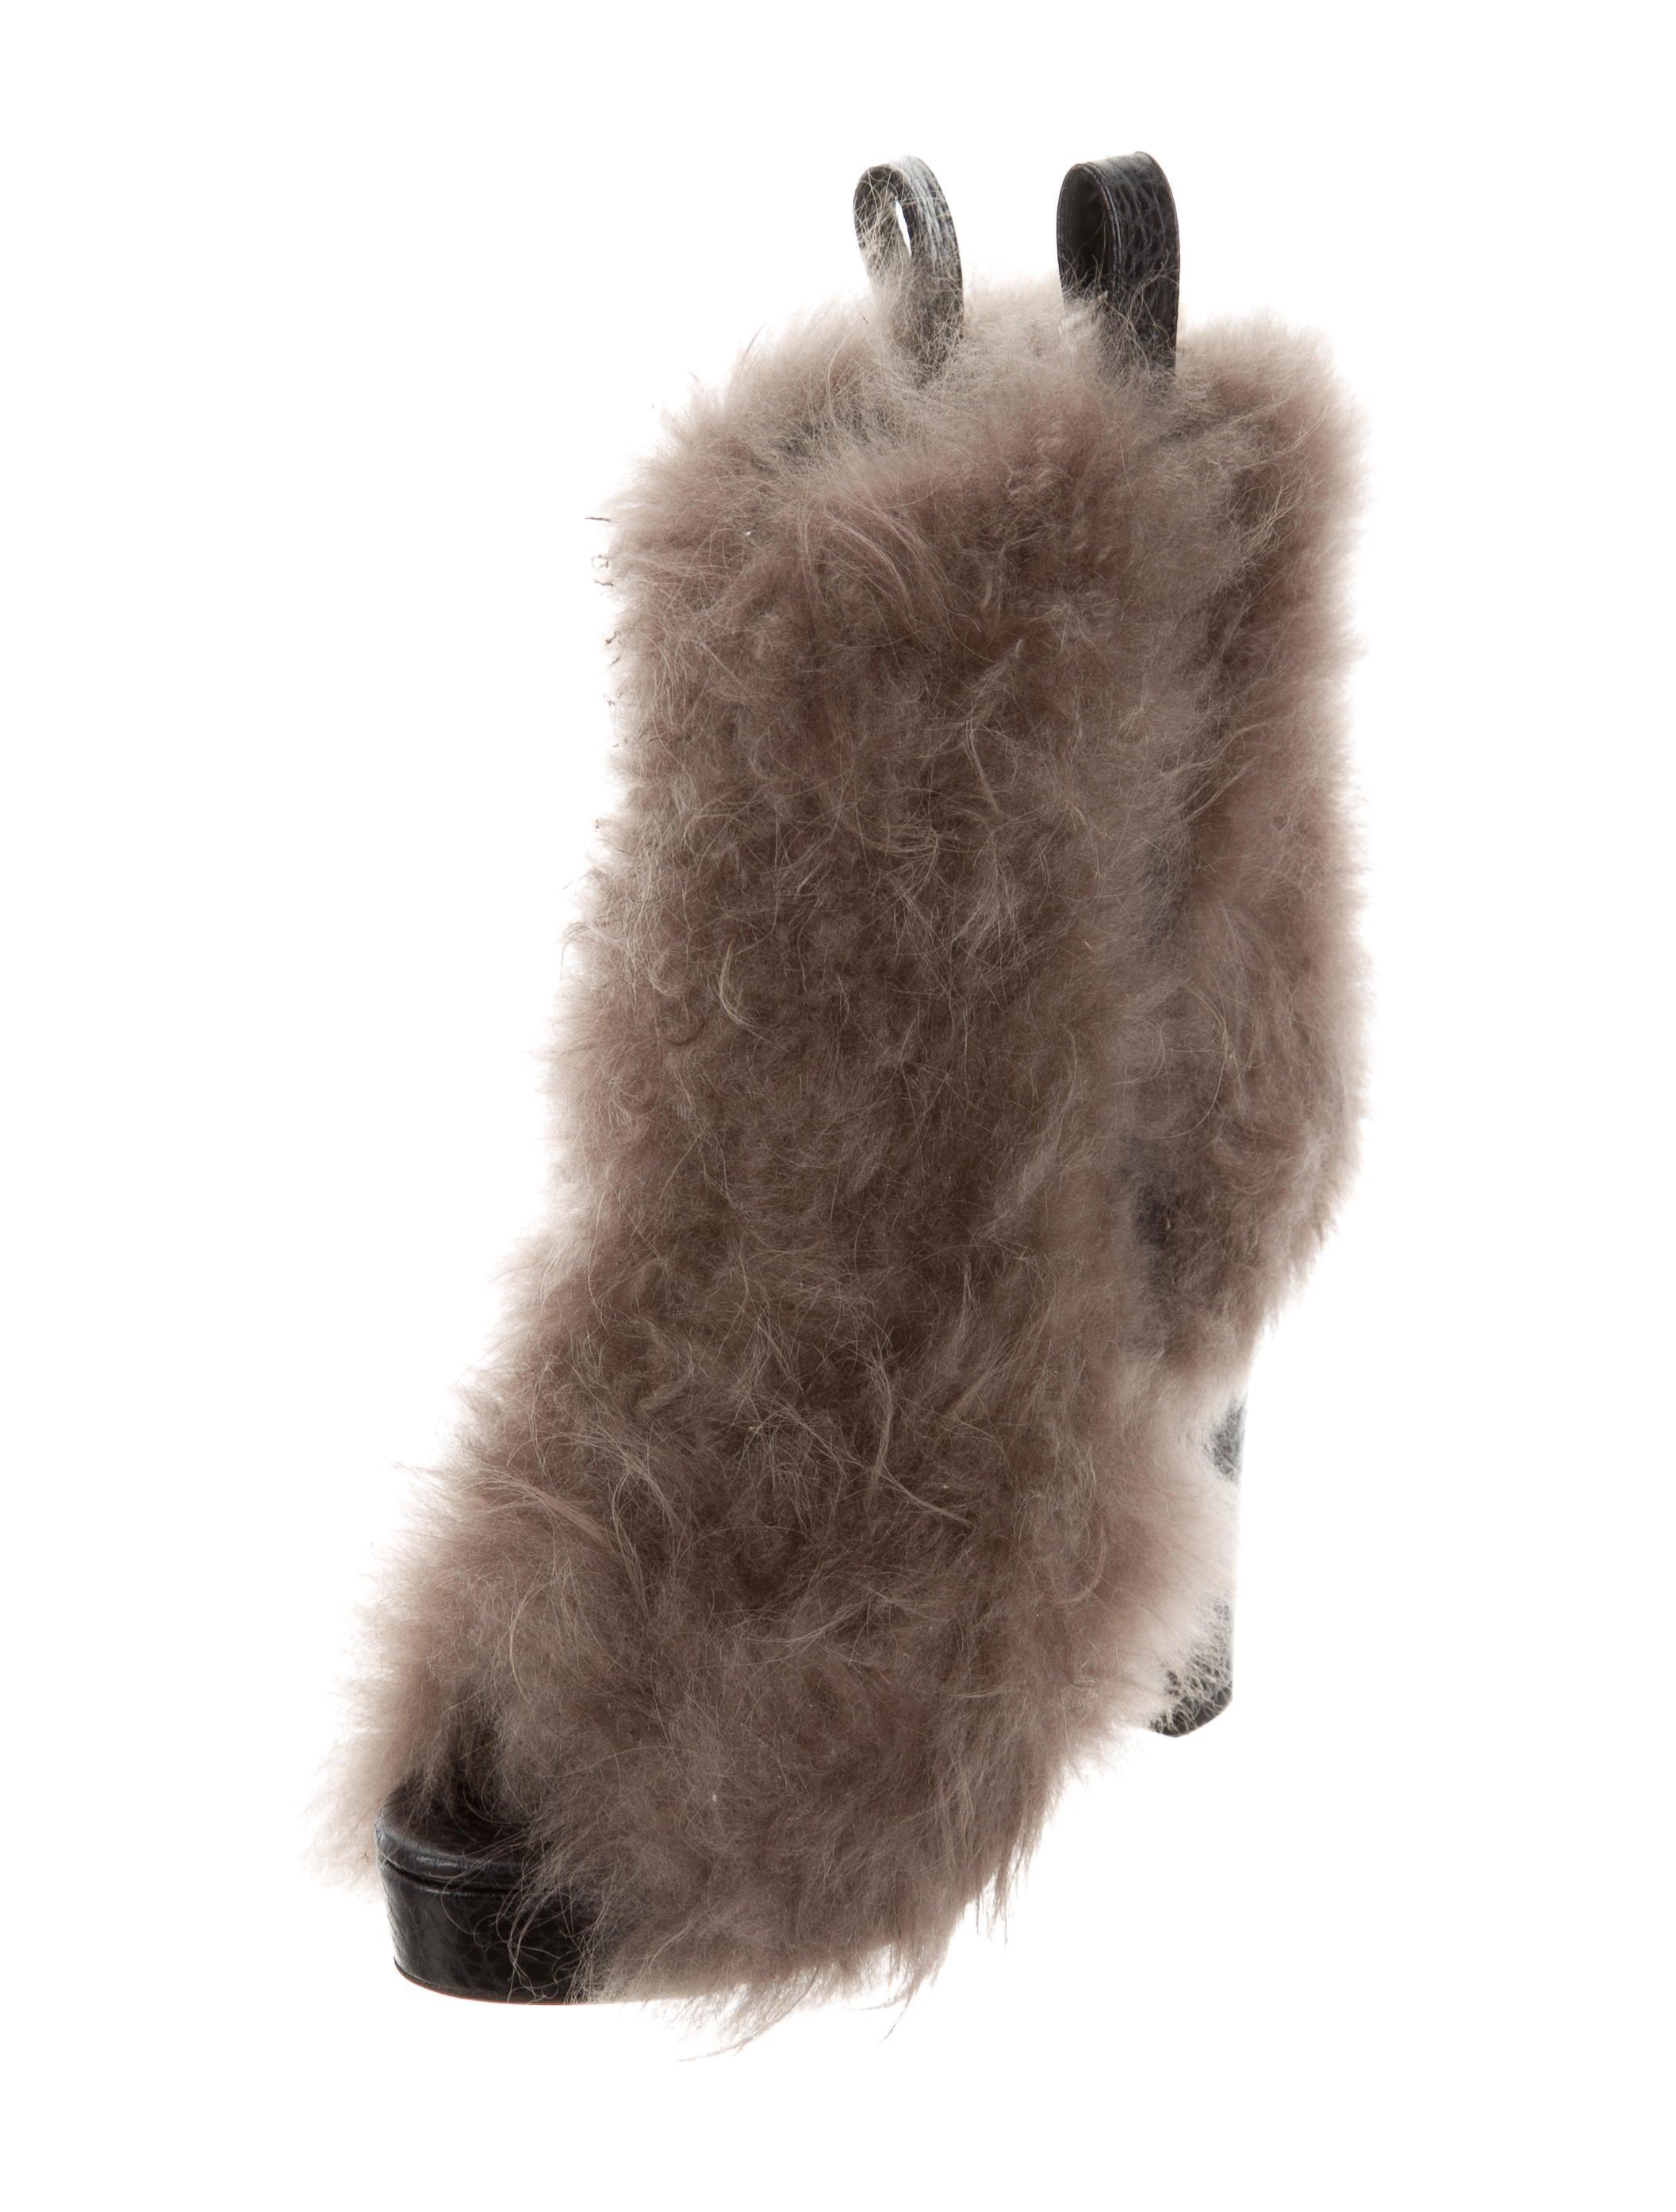 cheap sale eastbay footlocker pictures Brunello Cucinelli Shearling Peep-Toe Booties w/ Tags shop cheap online Bu6ziuNV